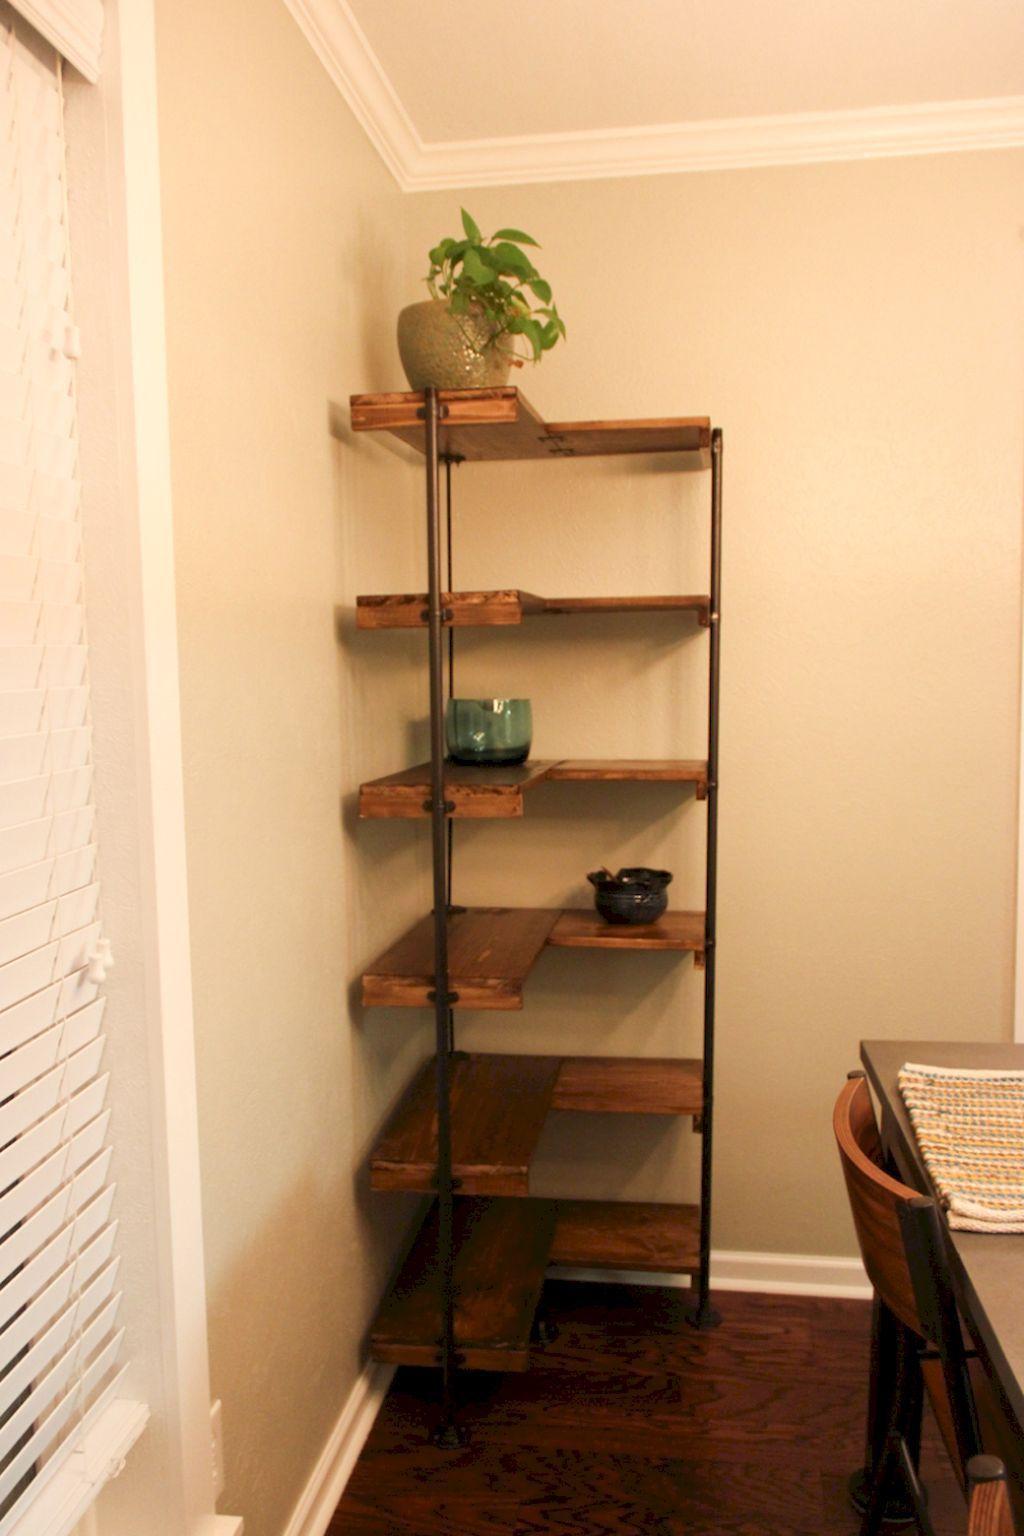 101+ DIY Floating Shelves, bookshelf, and Wall Shelves Easy, Simple ...